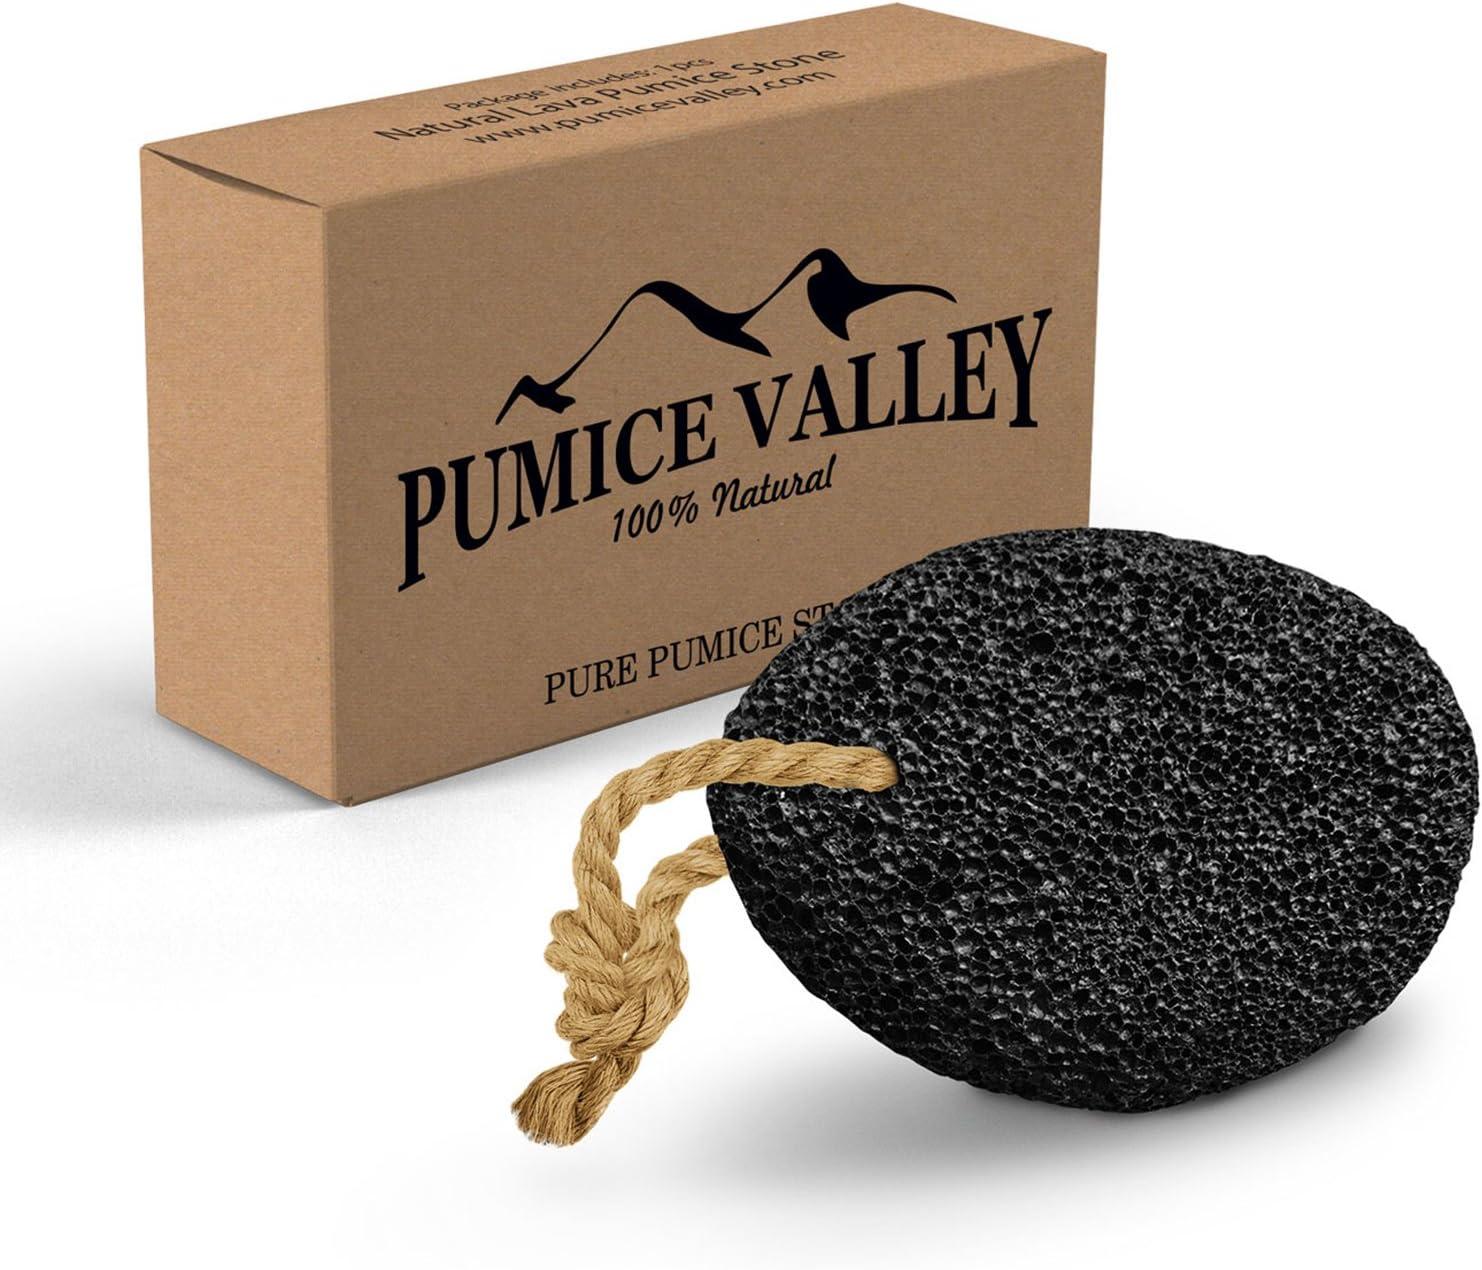 Pumice Stone - Natural Earth Lava Pumice Stone Black - Callus Remover for Feet Heels and Palm - Pedicure Exfoliation Tool - Corn Remover - Dry Dead Skin Scrubber - Health Foot Care: Health & Personal Care